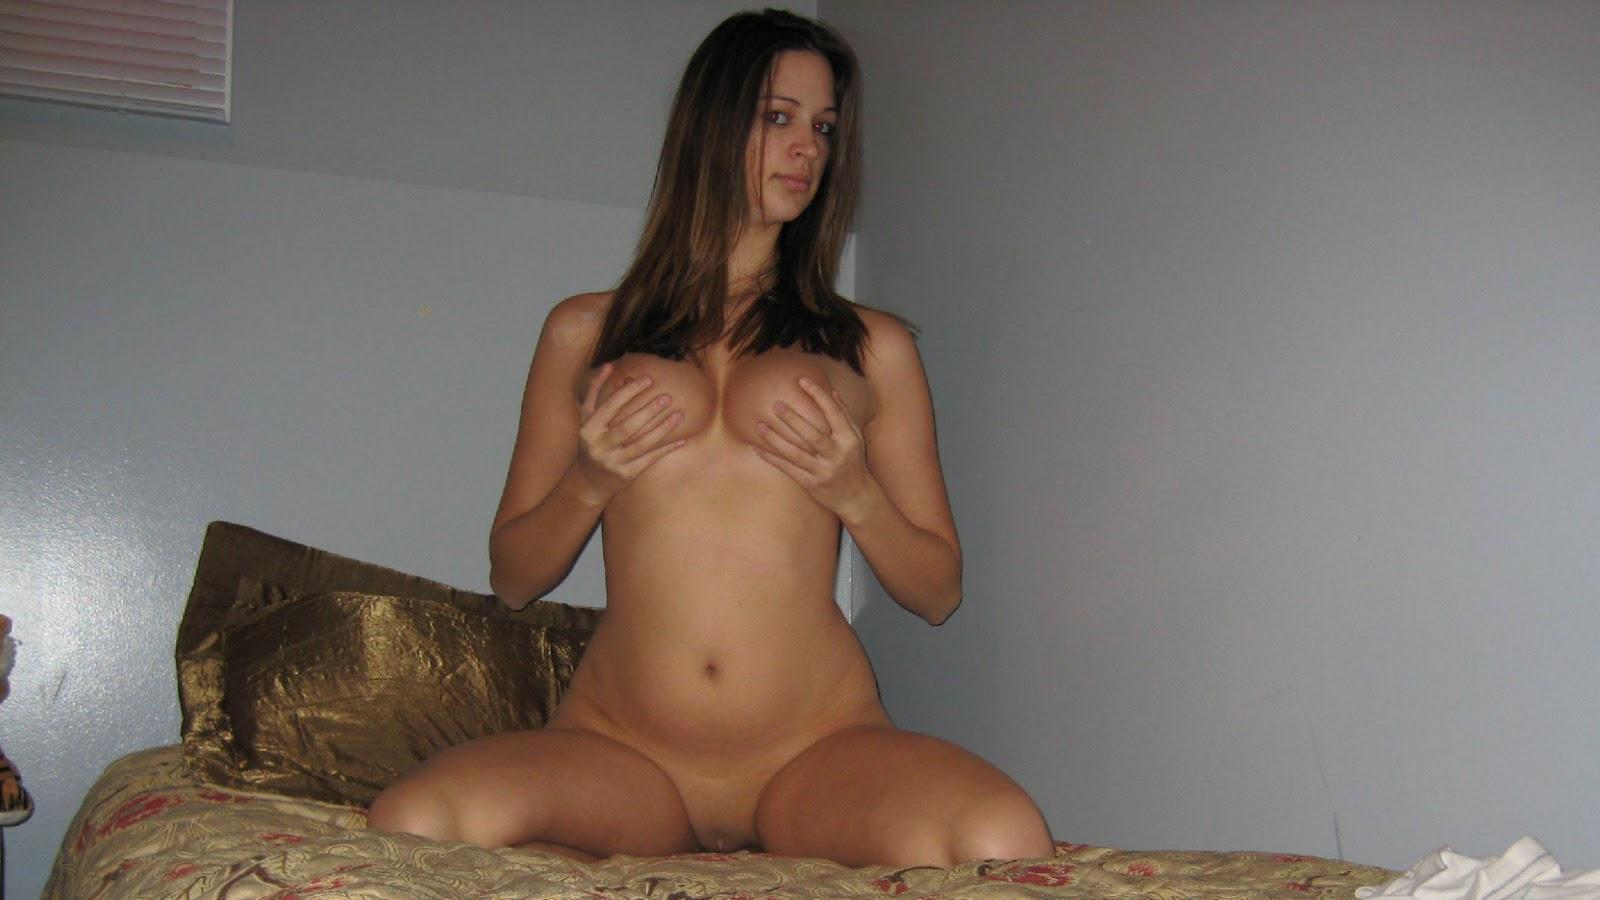 Ms girls homemade pussy pics